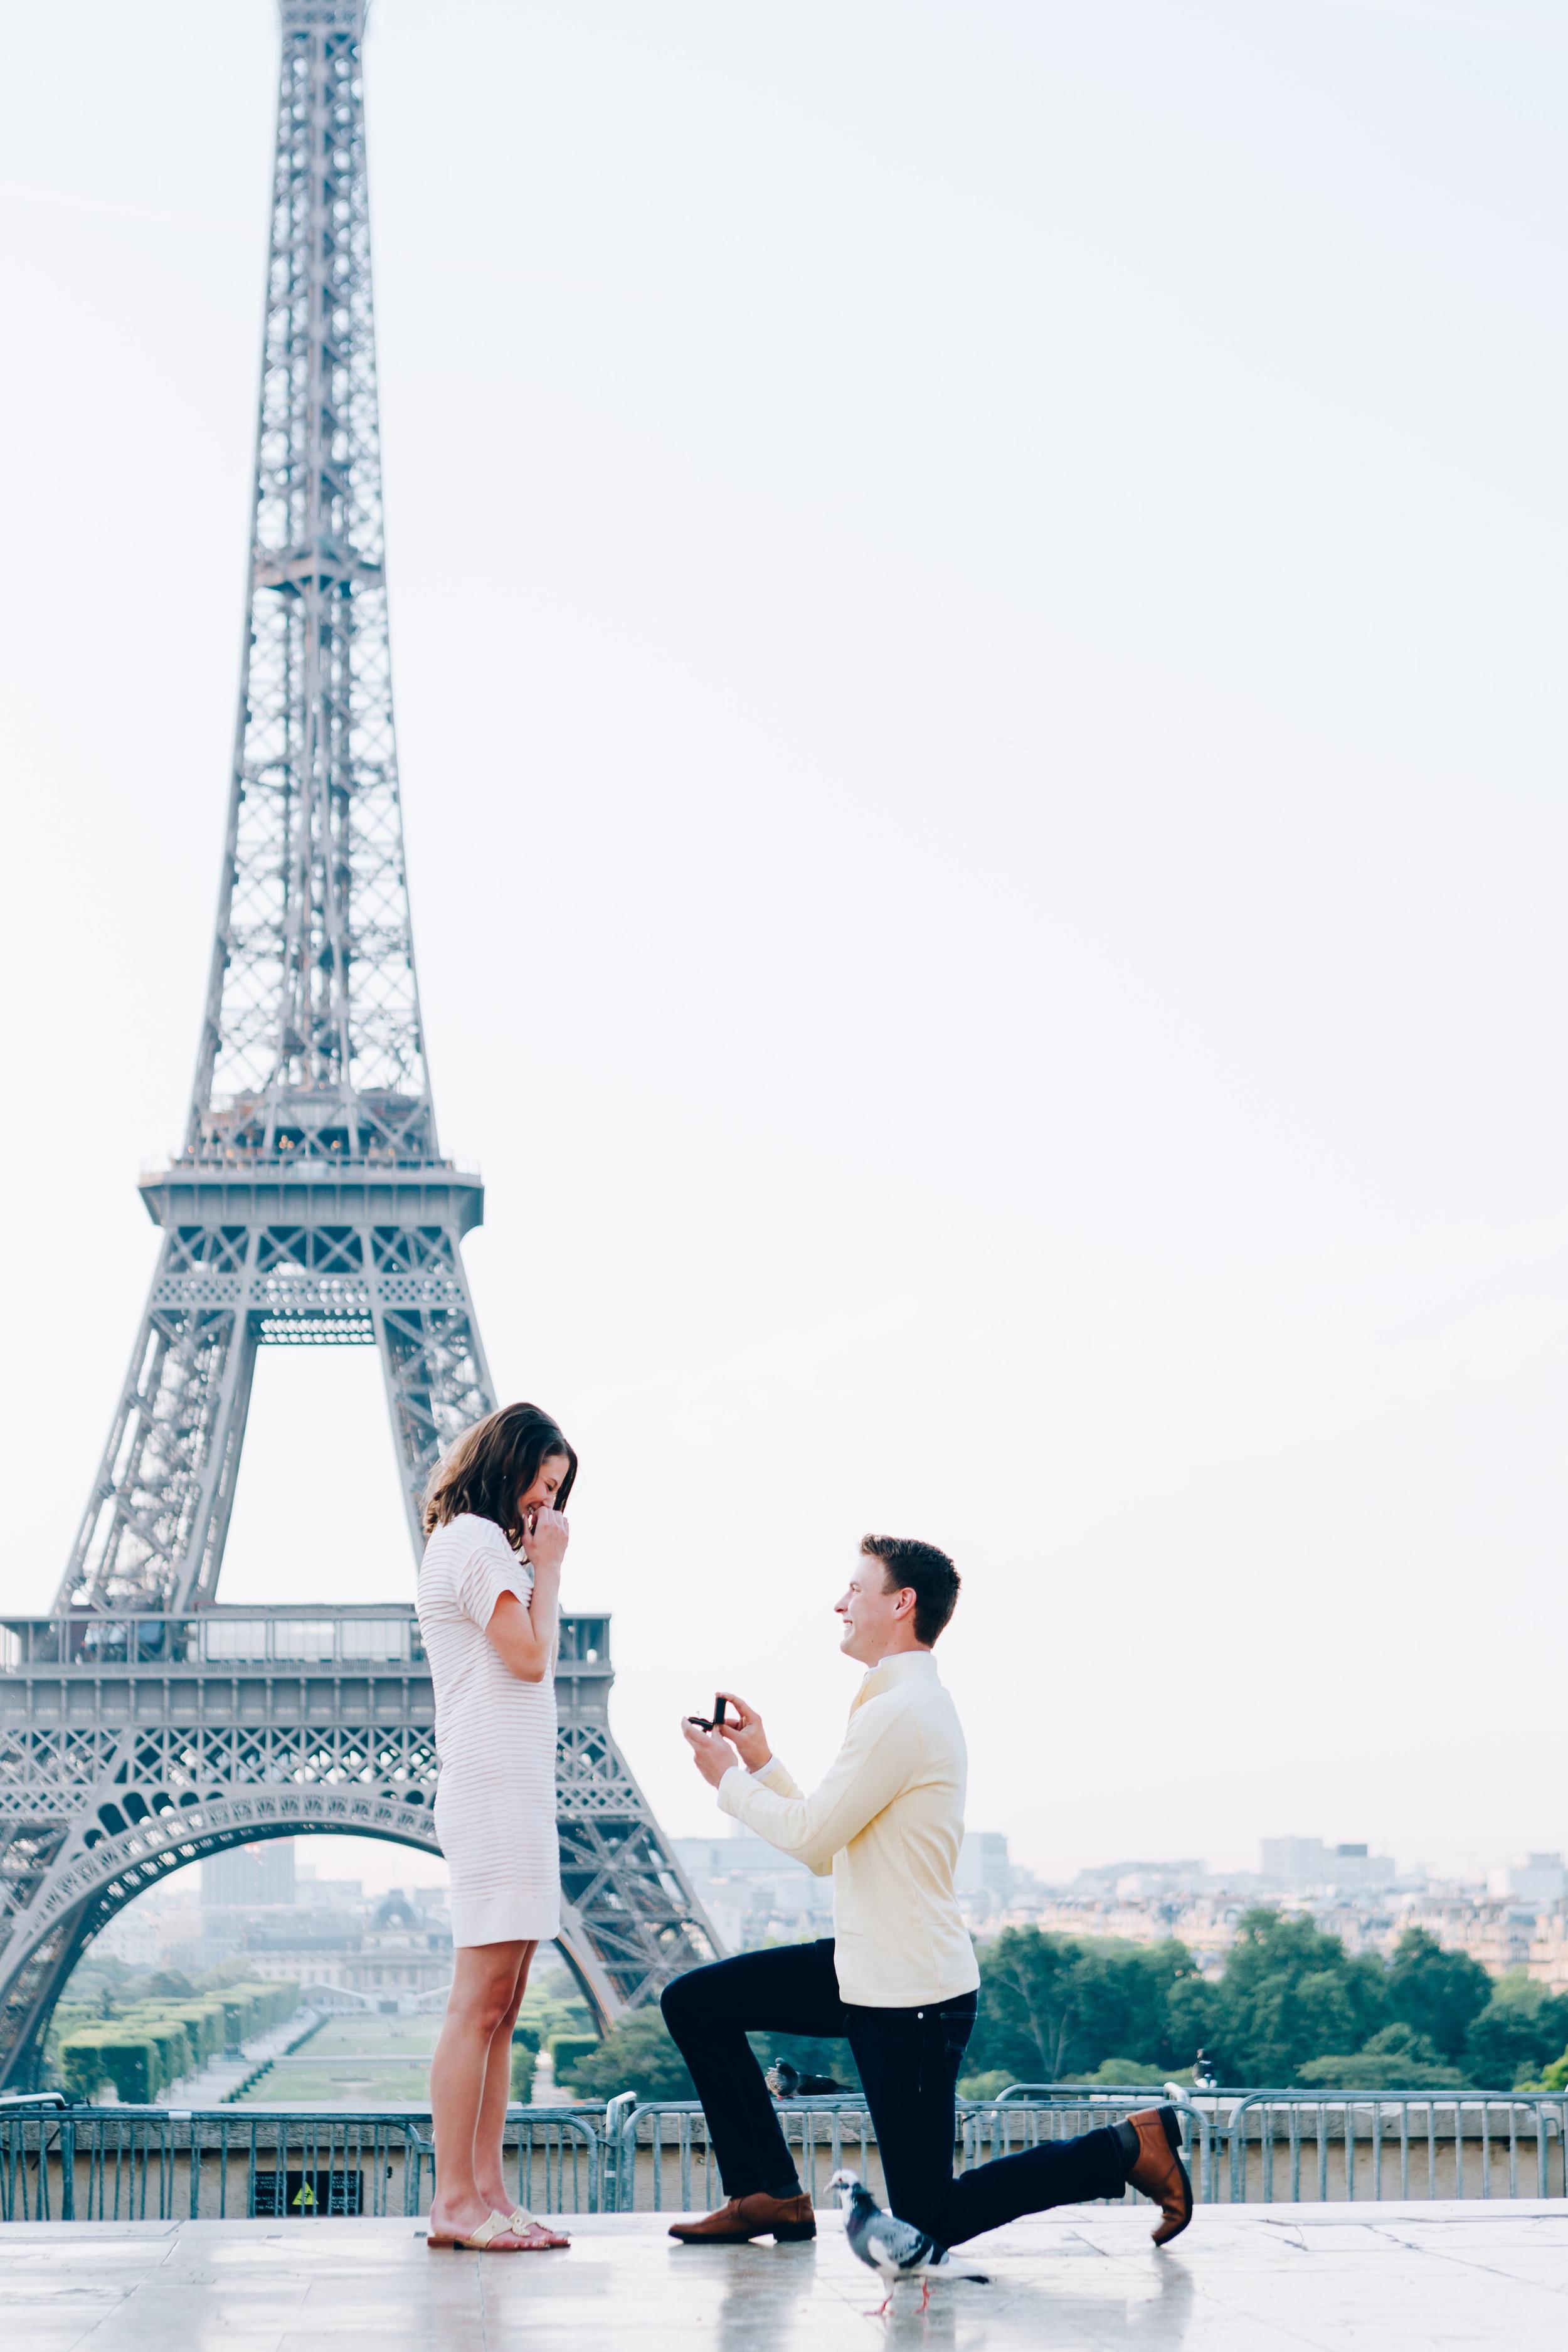 Paris-Photographer-Eiffel-Tower-Surprise-Proposal-She-Said-Yes-Engagement-Ring-Iheartparisfr.jpg